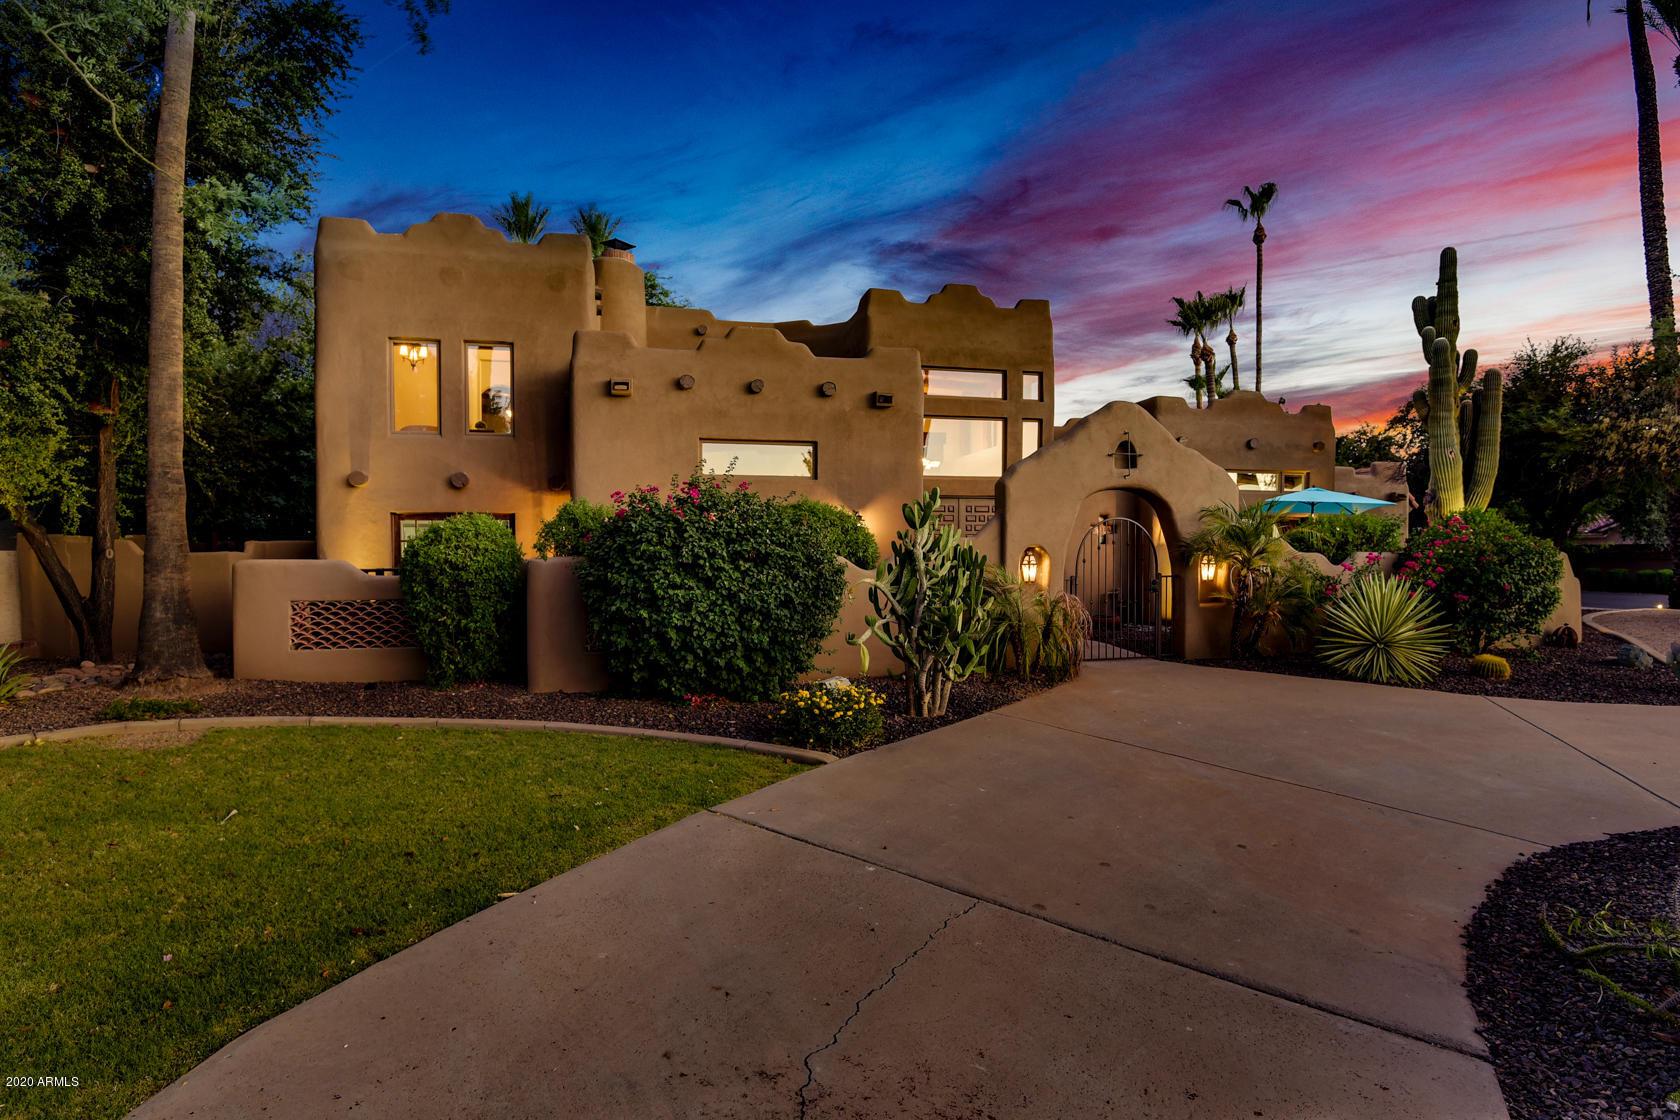 Photo of 1505 E LOS ARBOLES Drive, Tempe, AZ 85284